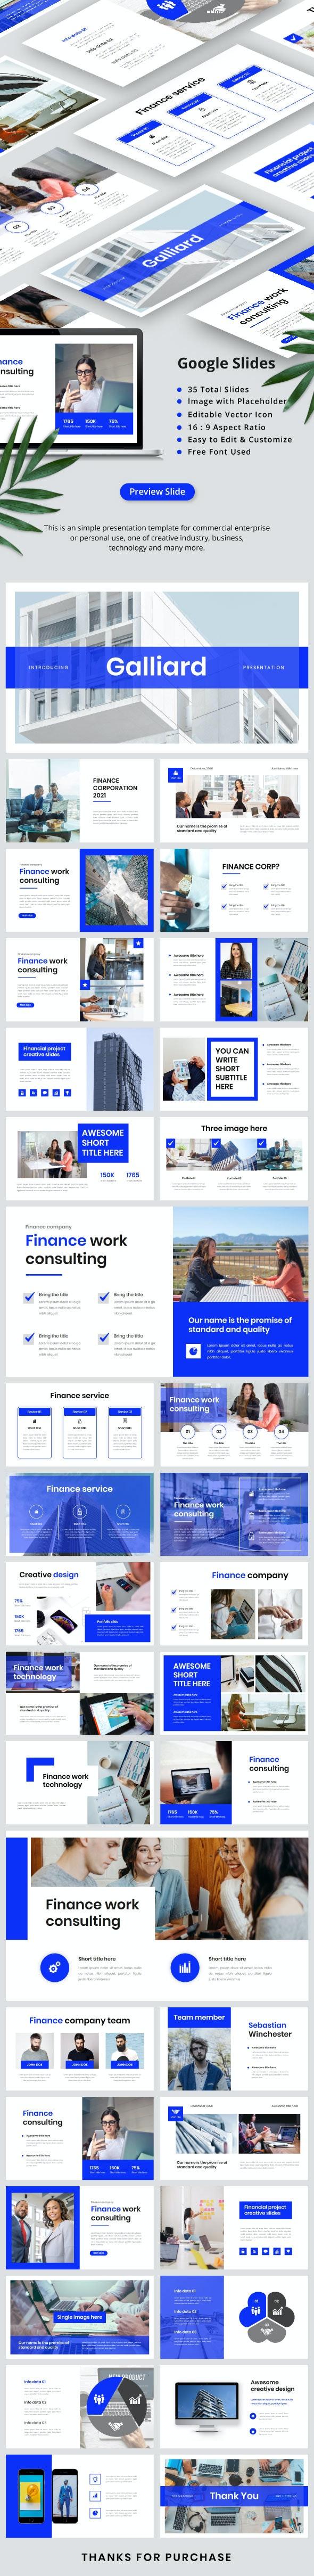 Galliard Finance - Google Slides - Google Slides Presentation Templates